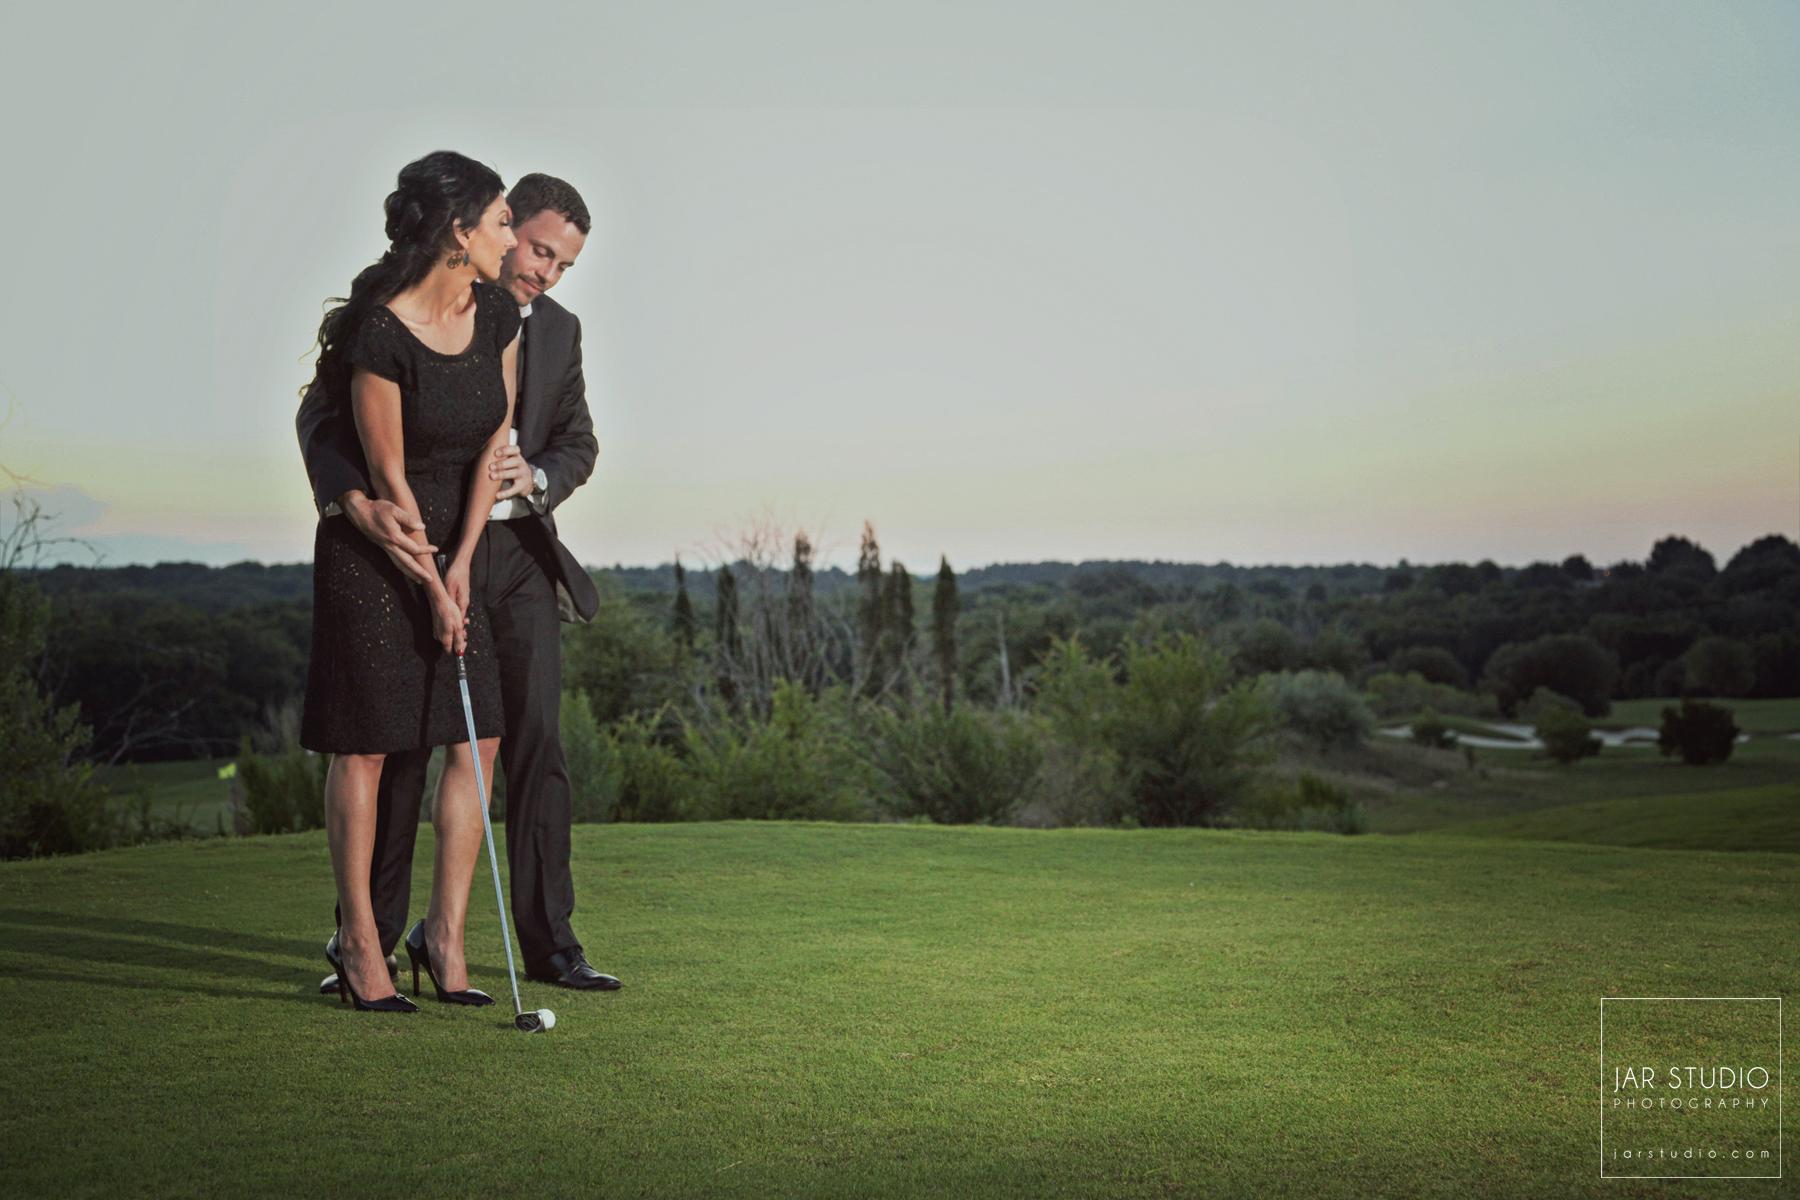 13-golf-course-at-bella-collina-jarstudio.jpg